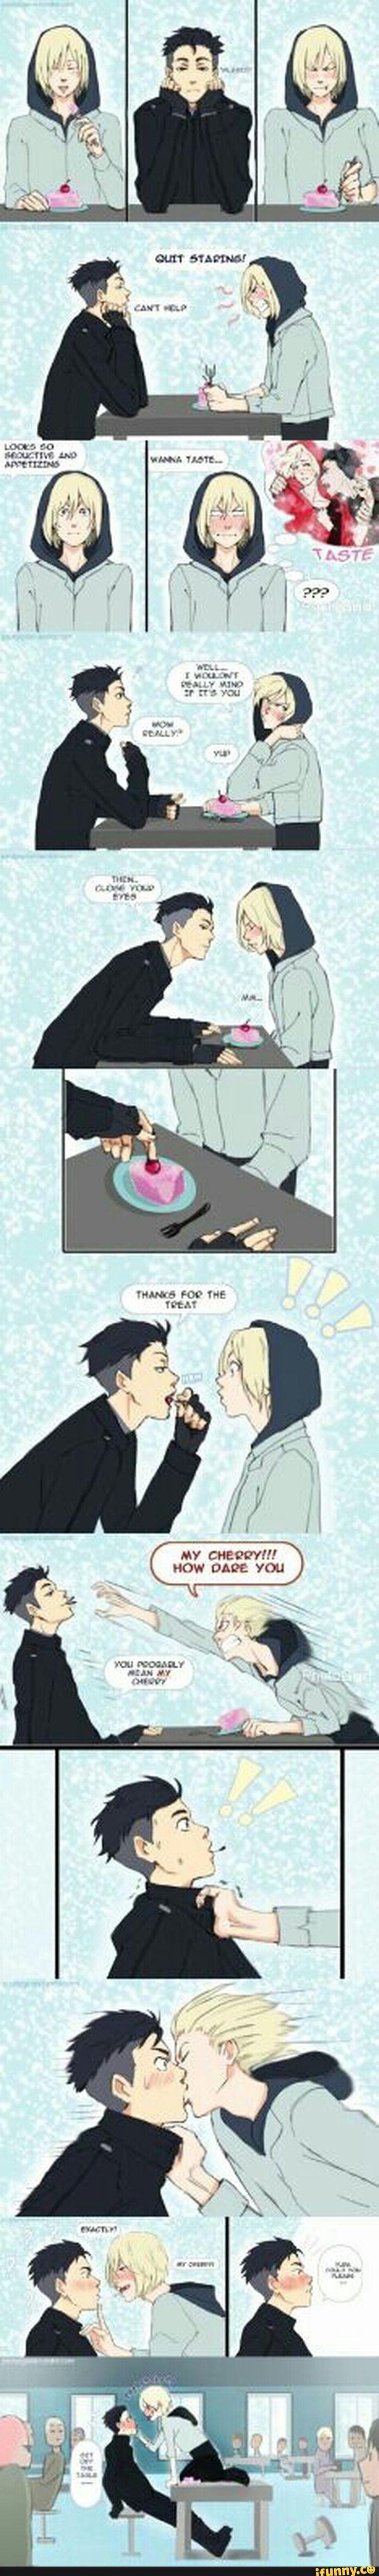 Seems like something Yurio would do xD